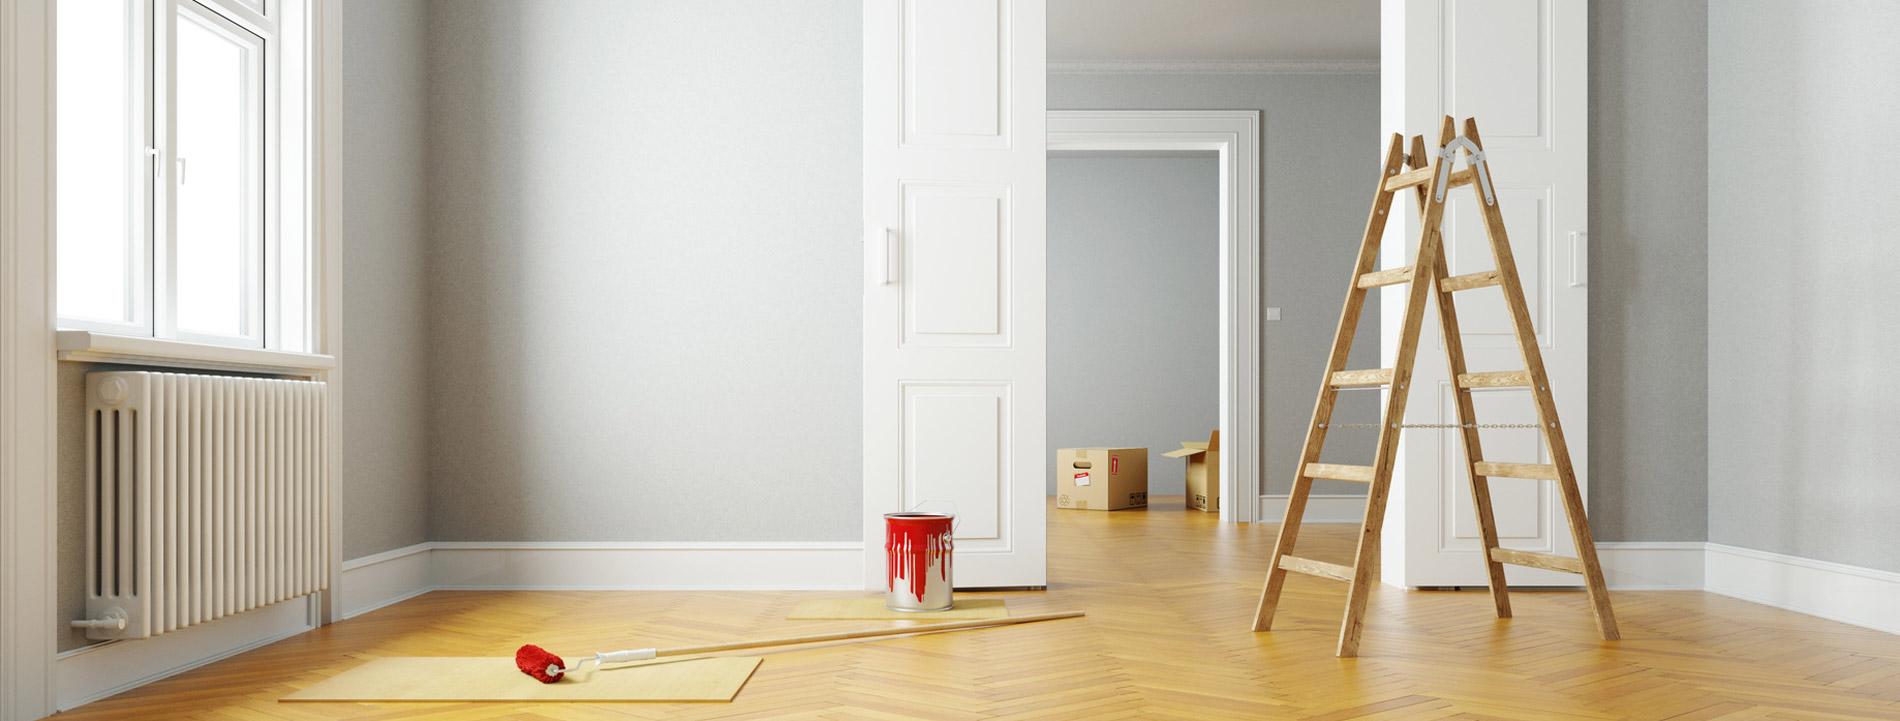 Malerbetrieb_Vissing_Leistung